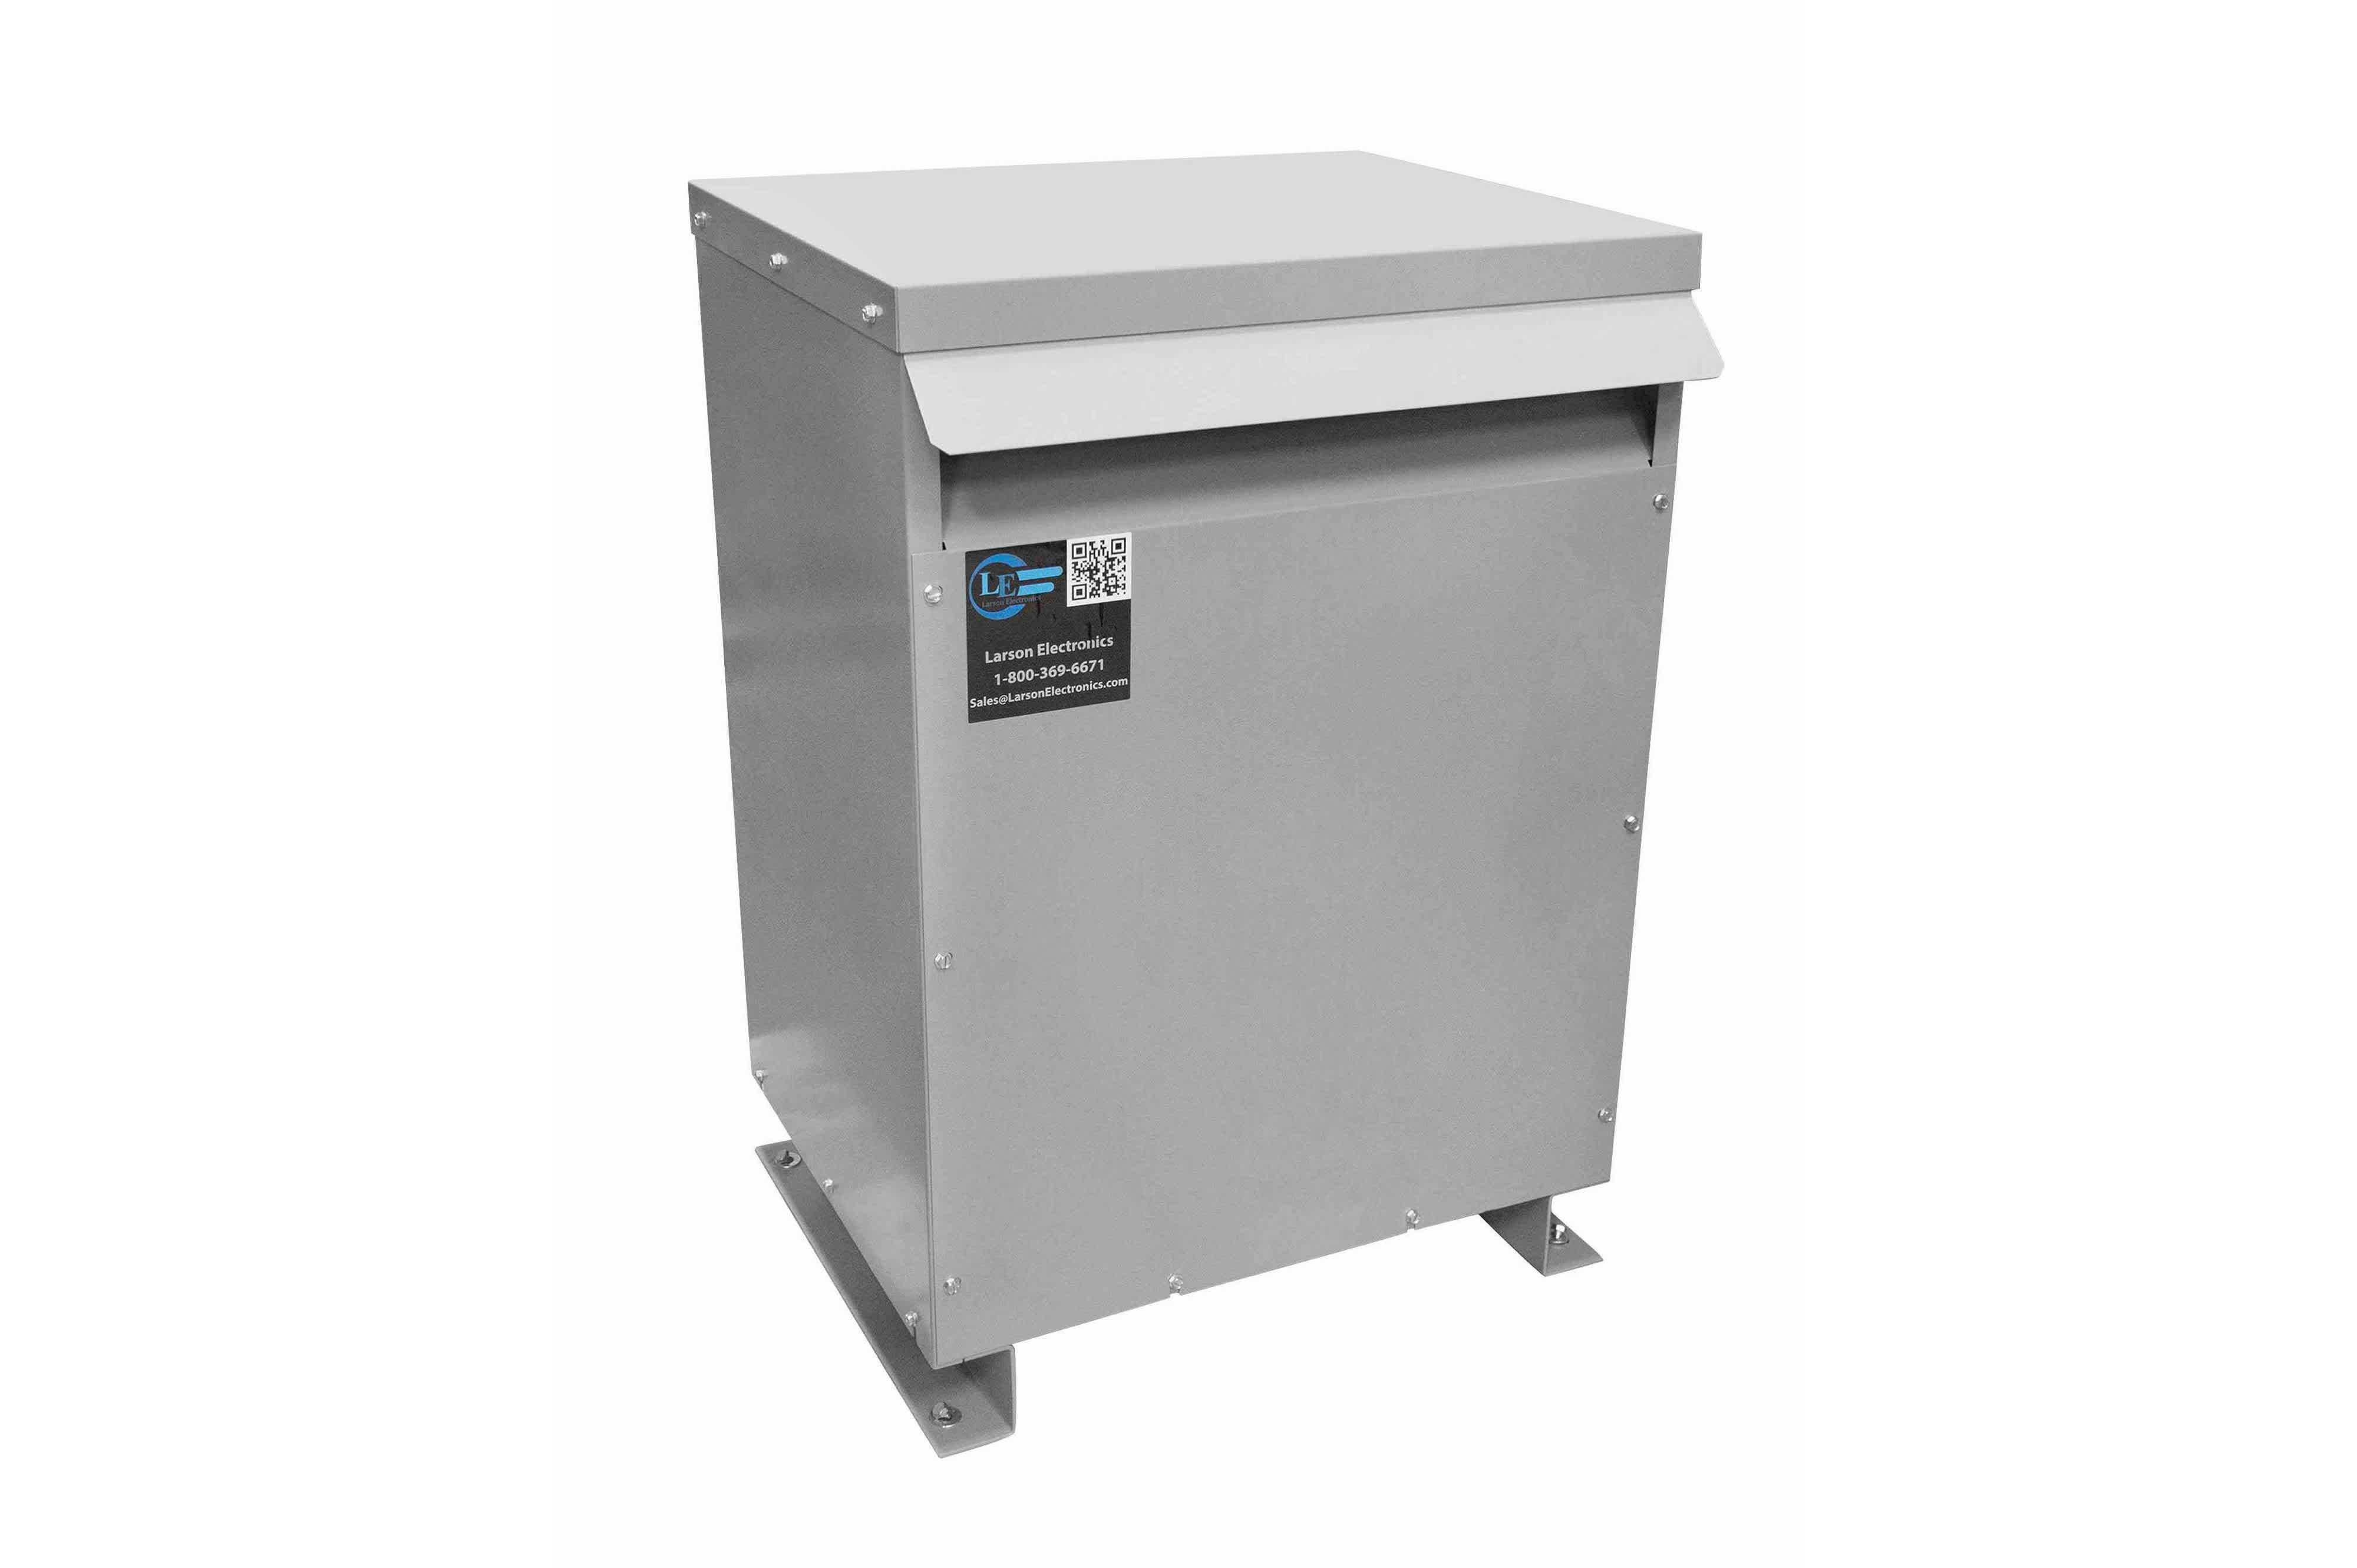 300 kVA 3PH DOE Transformer, 380V Delta Primary, 600Y/347 Wye-N Secondary, N3R, Ventilated, 60 Hz